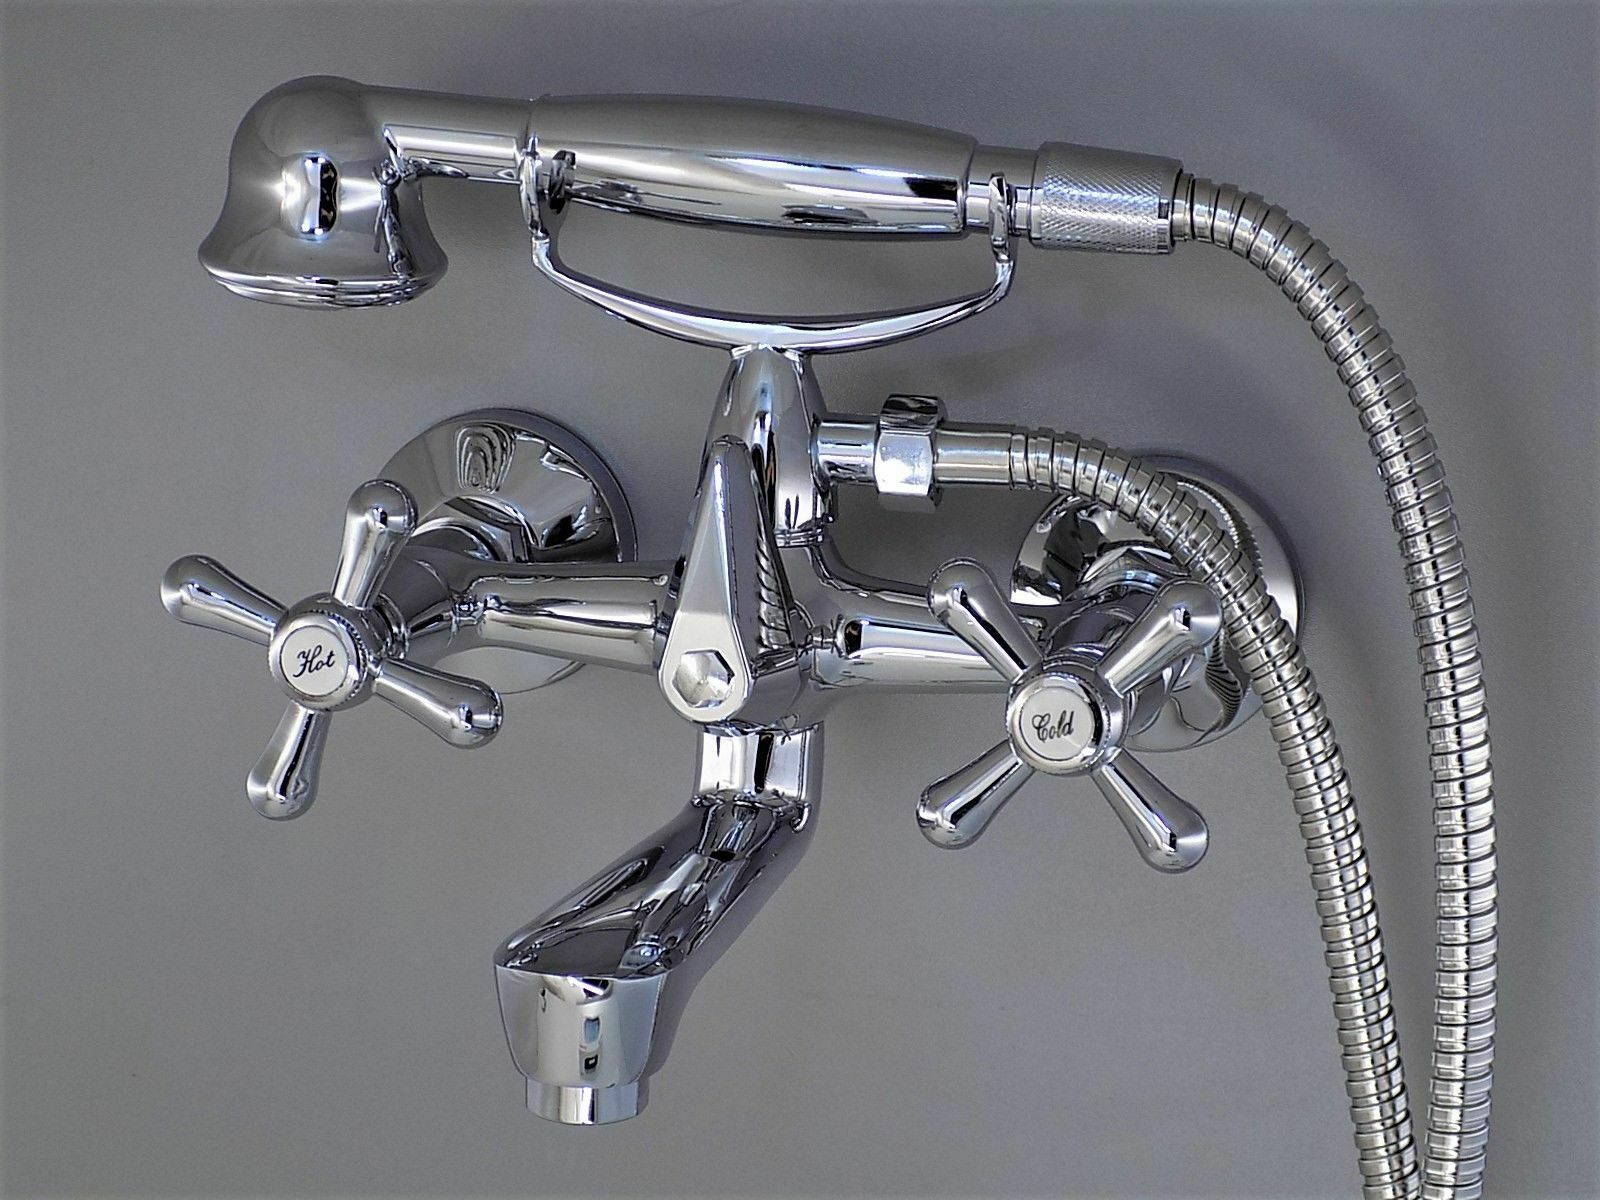 Nostalgie armatur Badewannenarmatur Armatur Retro Badarmatur Wanne Dusche